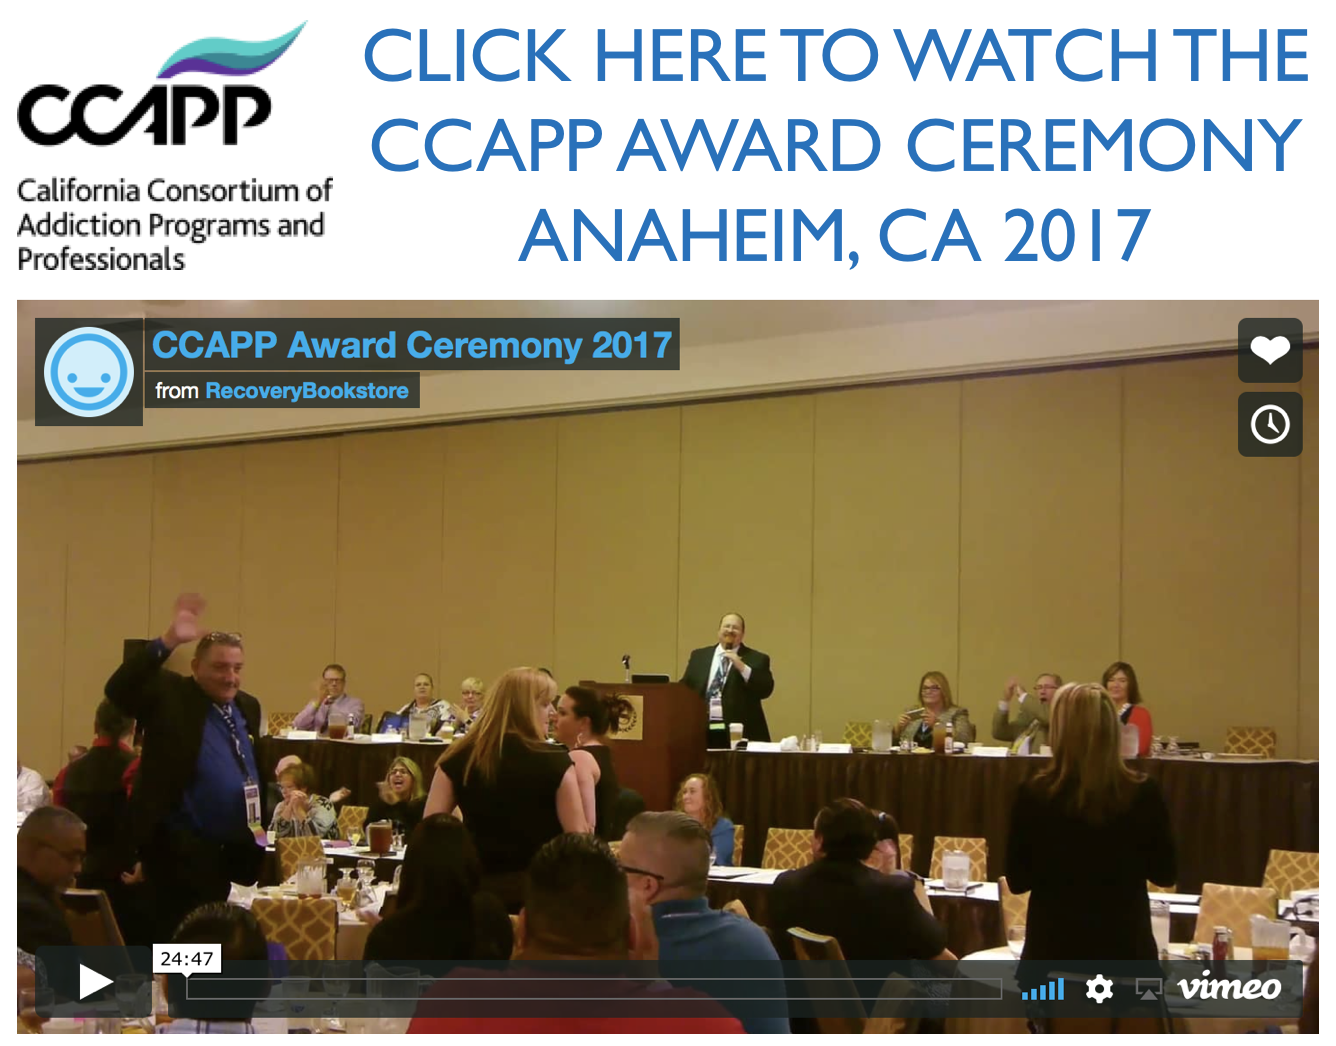 ccapp-awards-ceremony-2017.jpeg